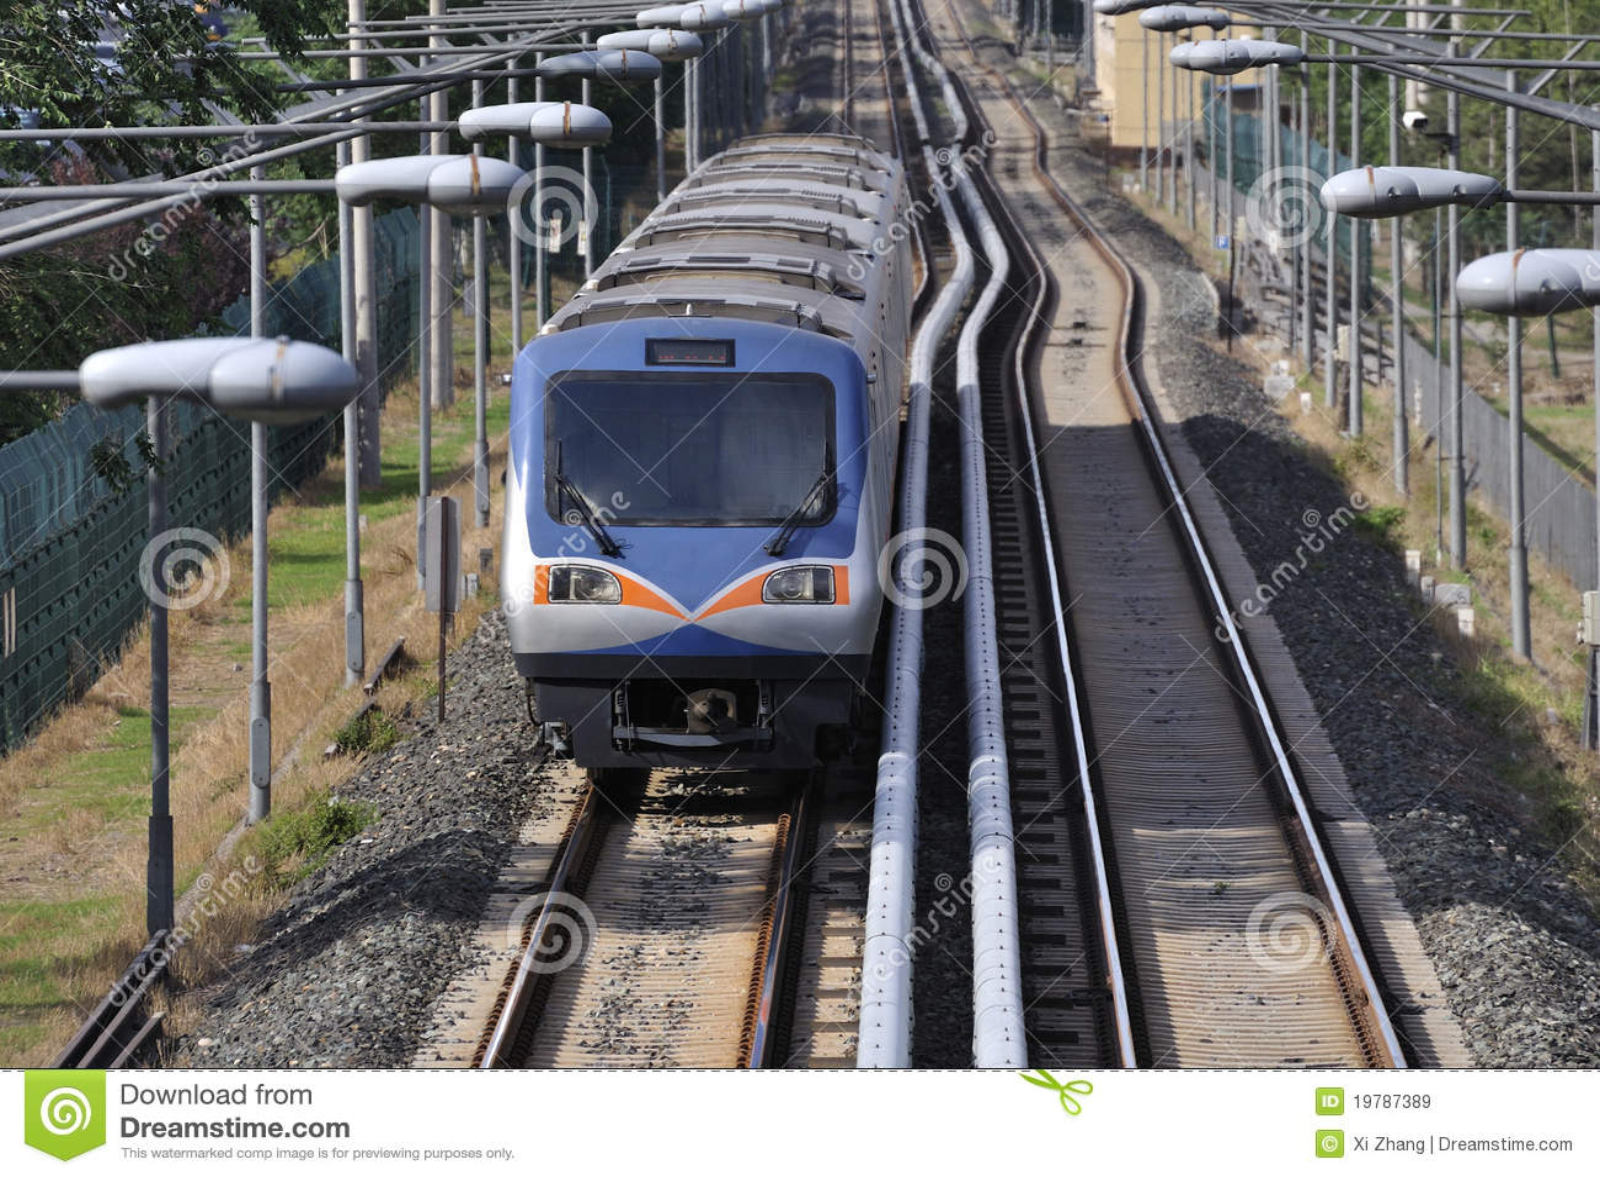 China beijing subwaylight rail stock image image of train track download china beijing subwaylight rail stock image image of train track mozeypictures Choice Image